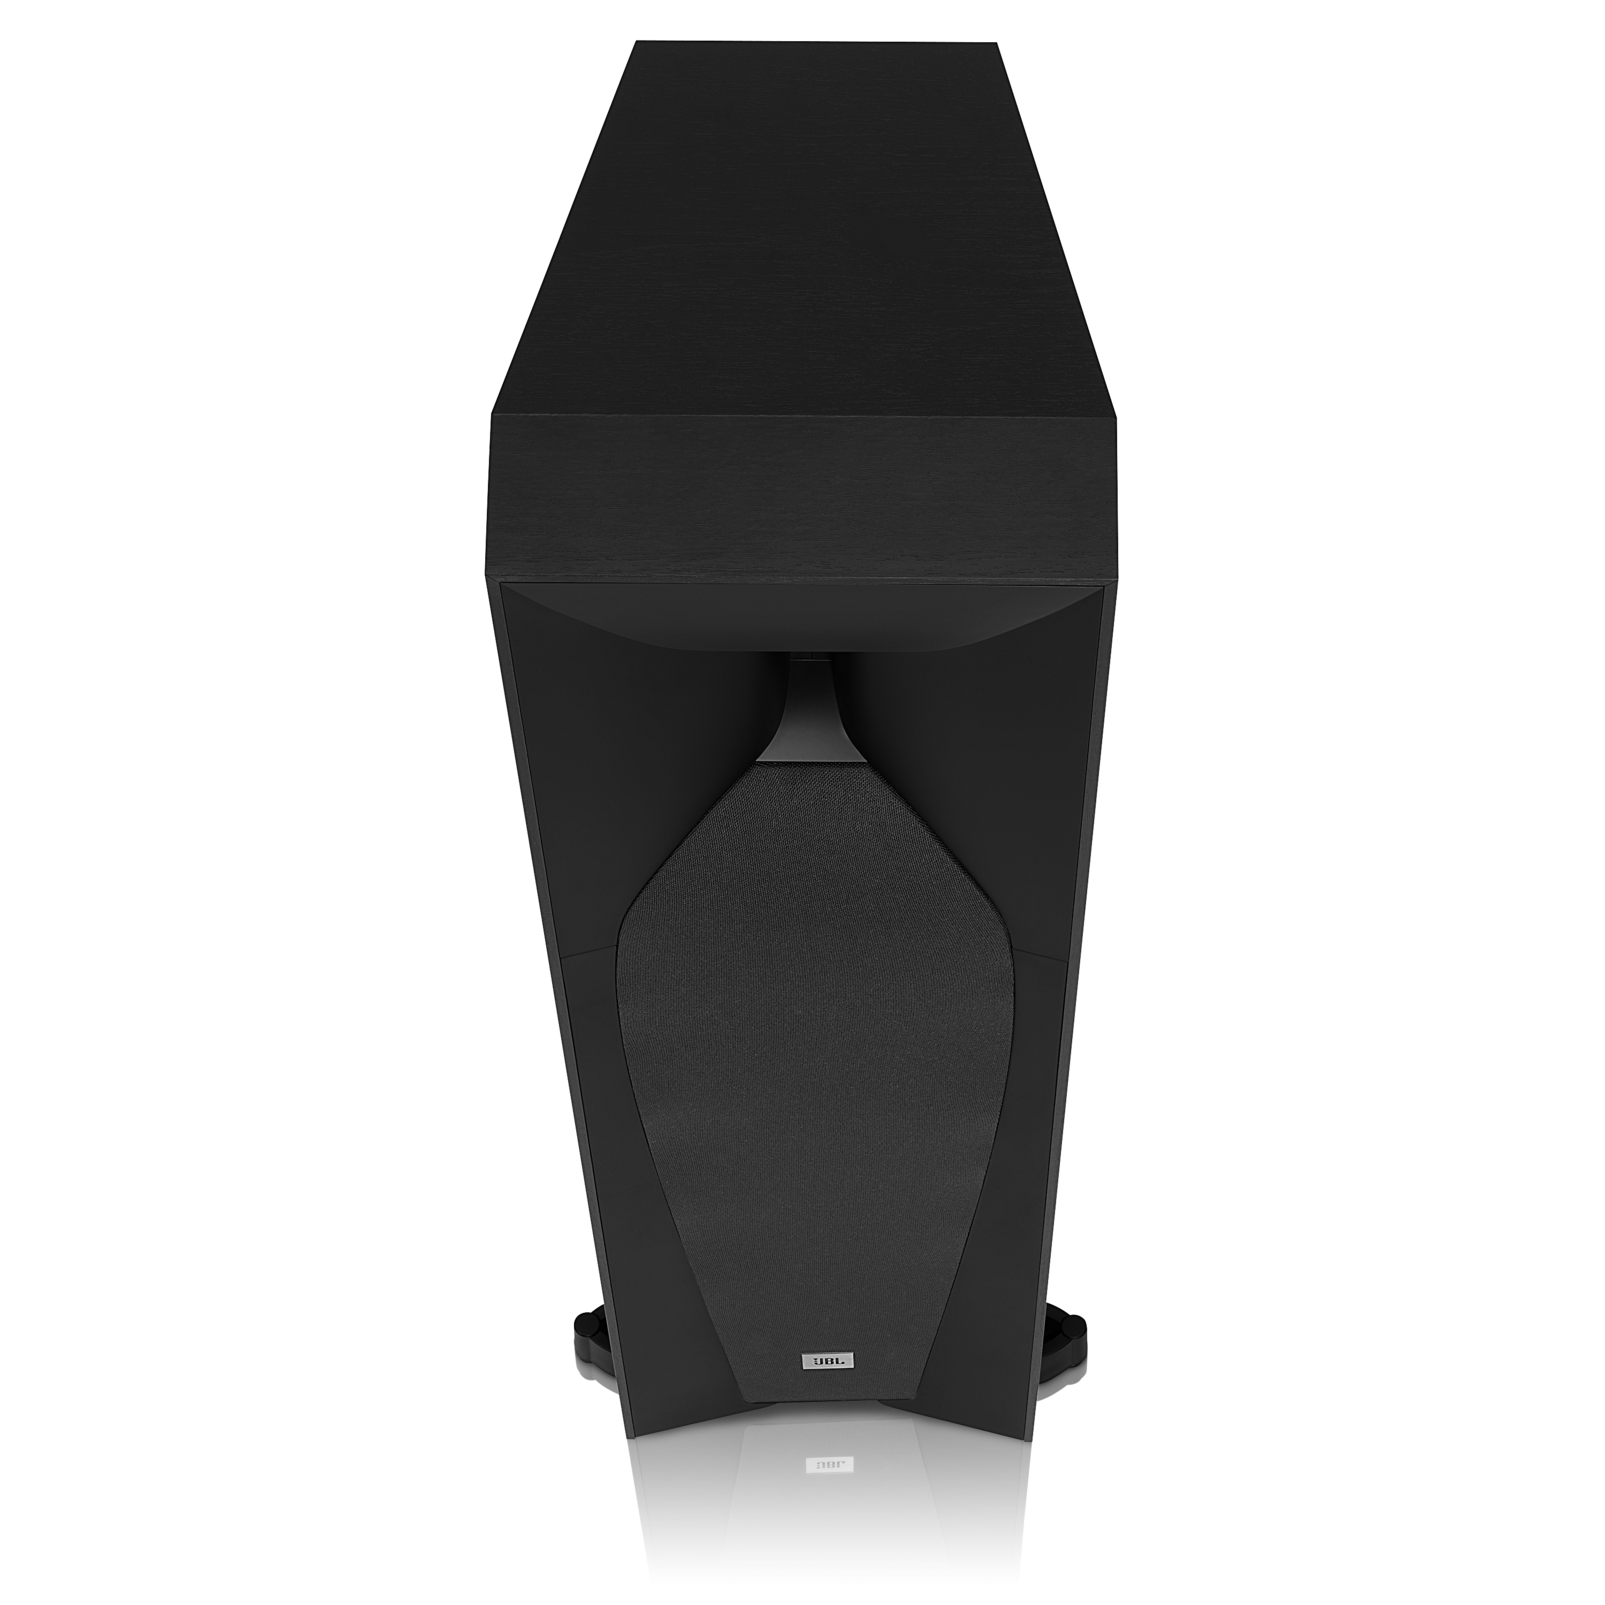 Studio 570 - Black - Professional-quality150-watt Floorstanding Speaker - Detailshot 2